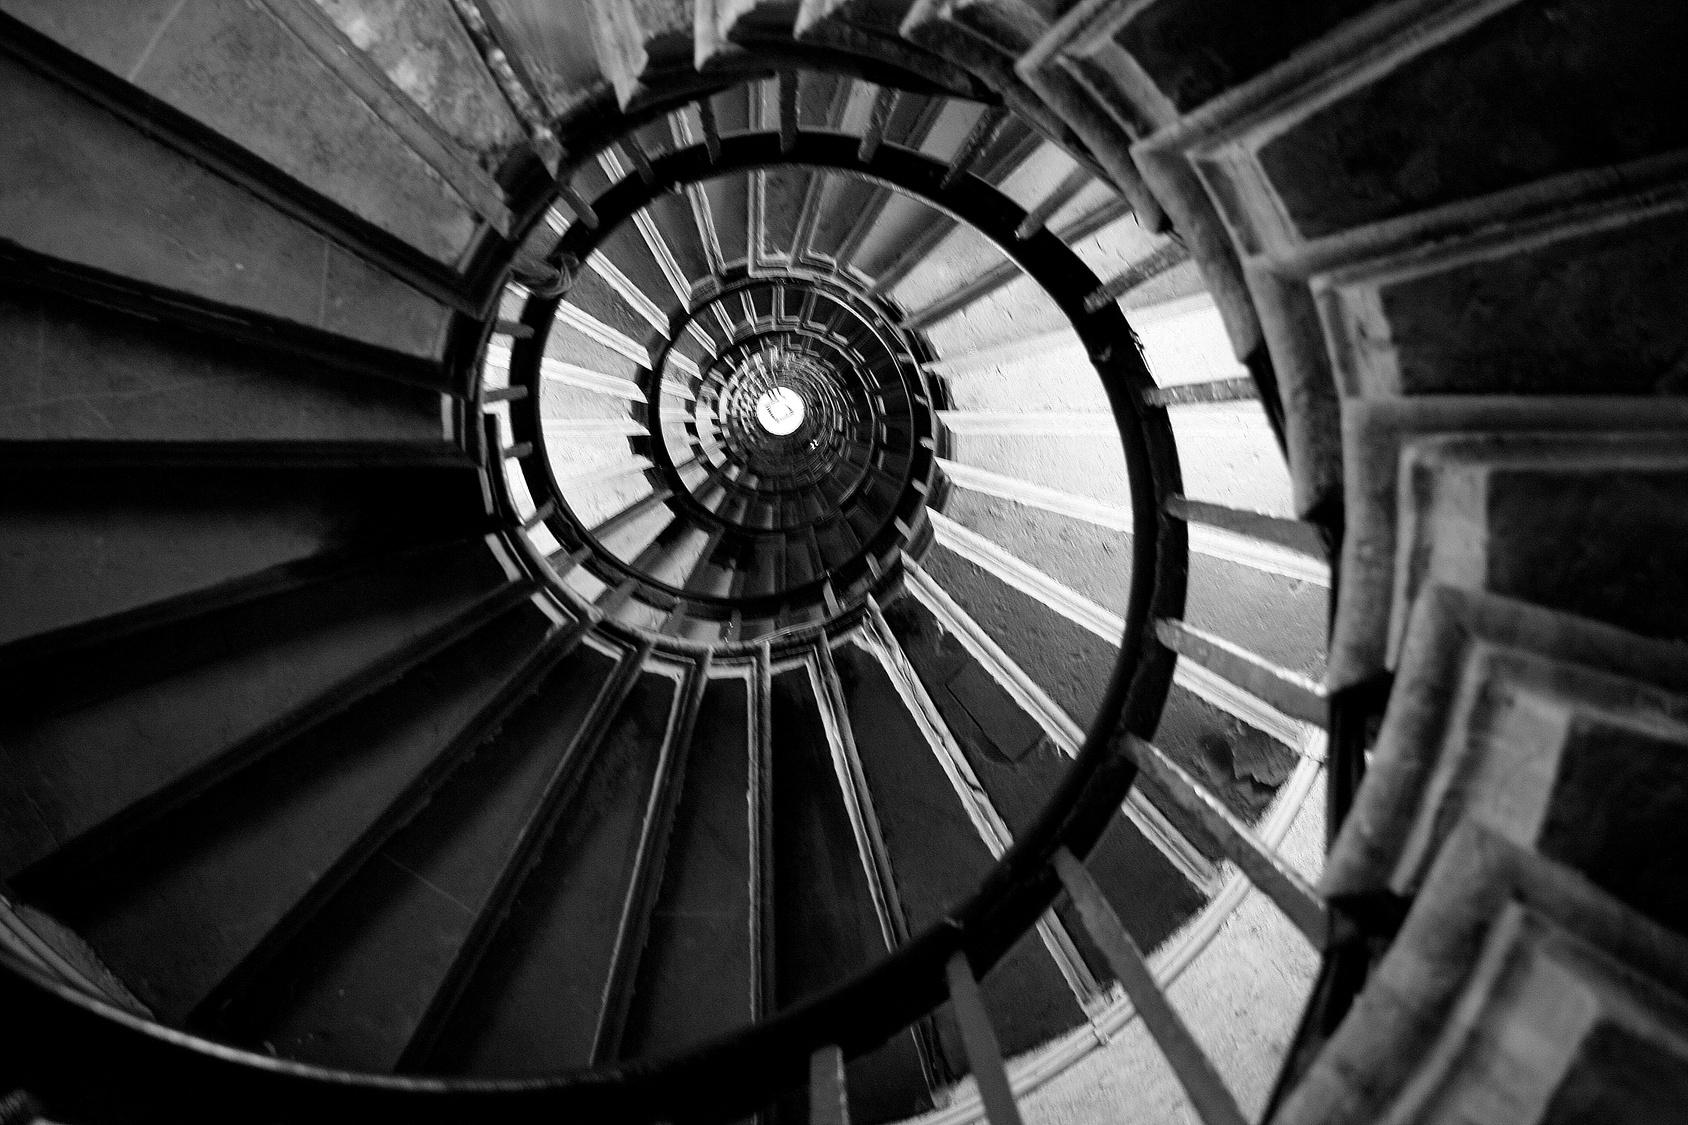 Spiral Staircase 3159867